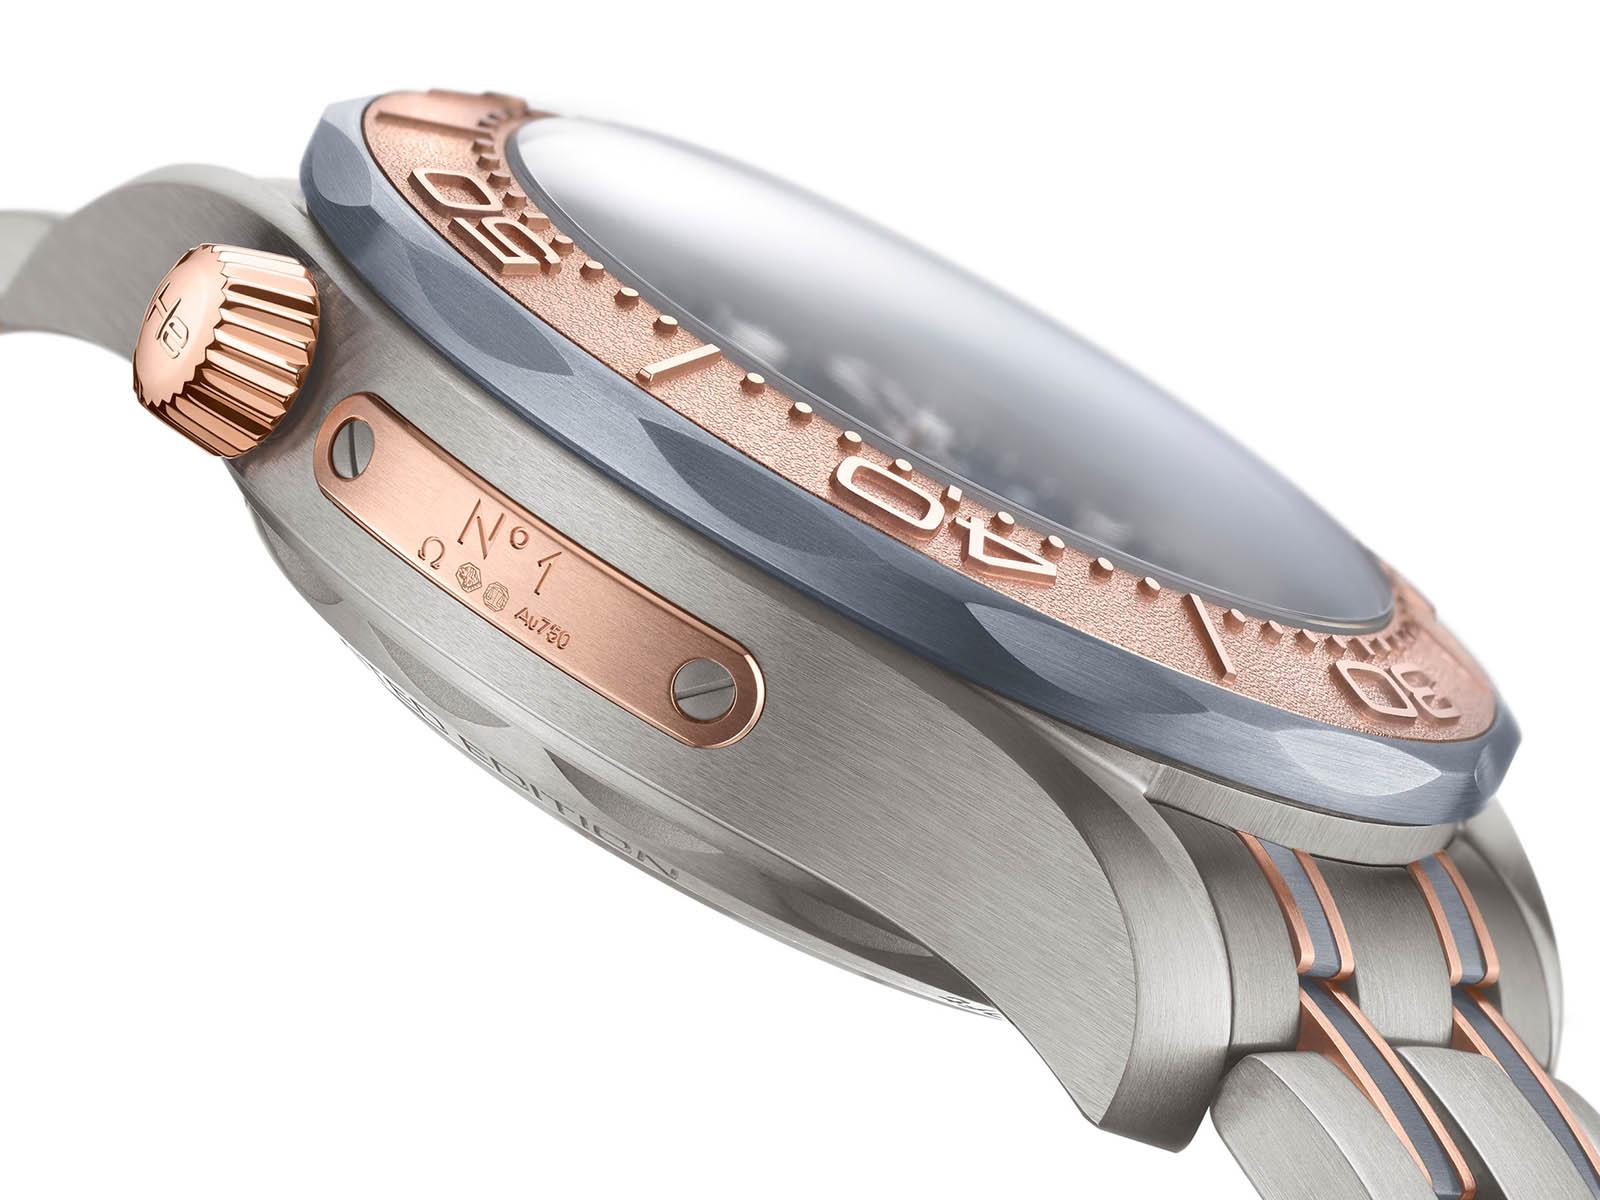 omega-seamaster-diver-300m-chronograph-gold-titanium-tantalum-7.jpg